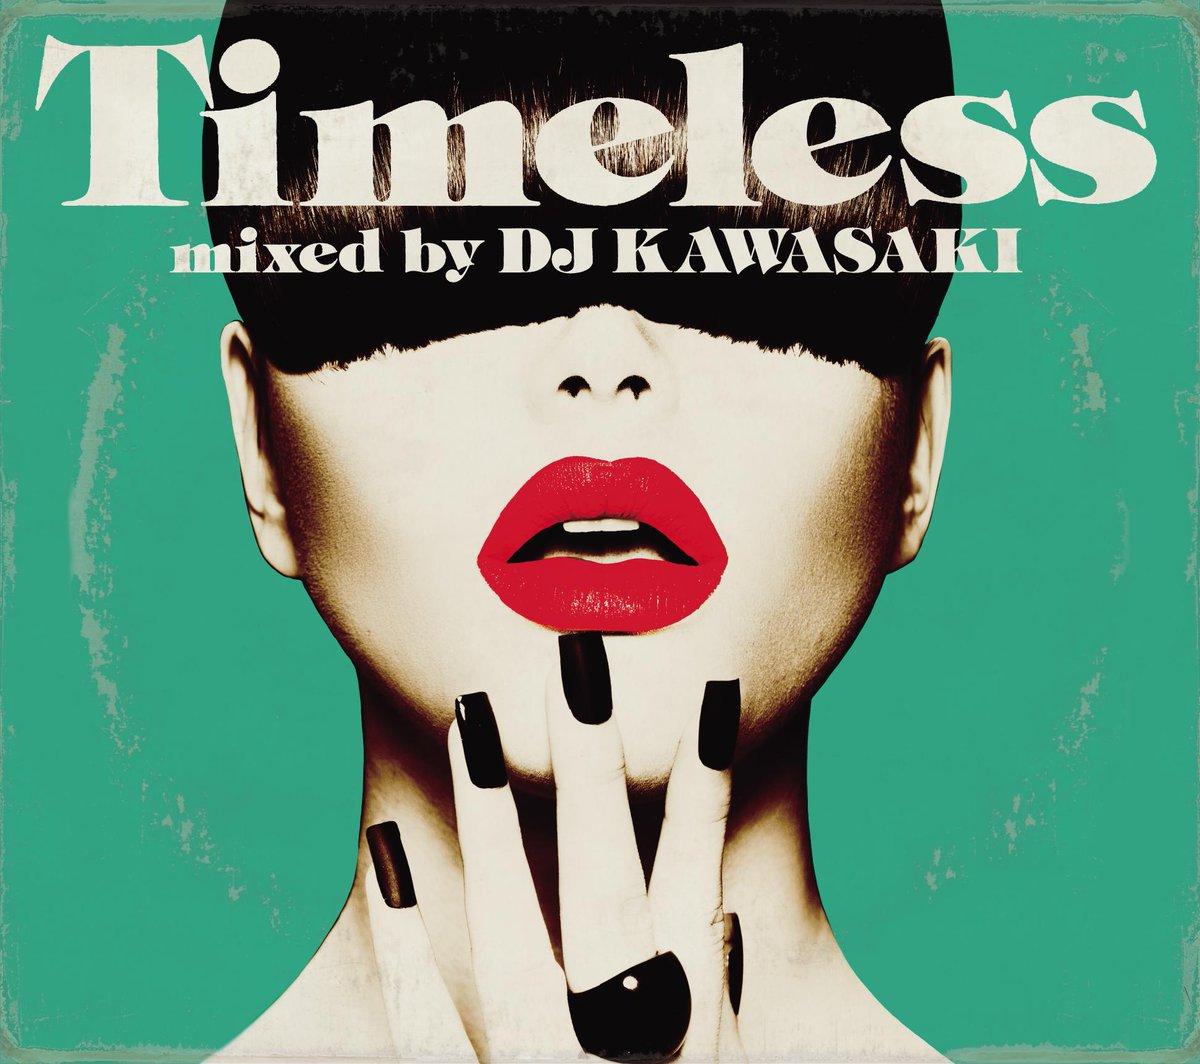 DJ KAWASAKI名義の作品のみを使ったベスト盤的DJ MIXが完成!『MAGIC』以来3枚目となるMIX CDをリリースします。『TIMELESS - mixed by DJ KAWASAK』2015.6.17(wed) 発売! http://t.co/ru4naxfpSX